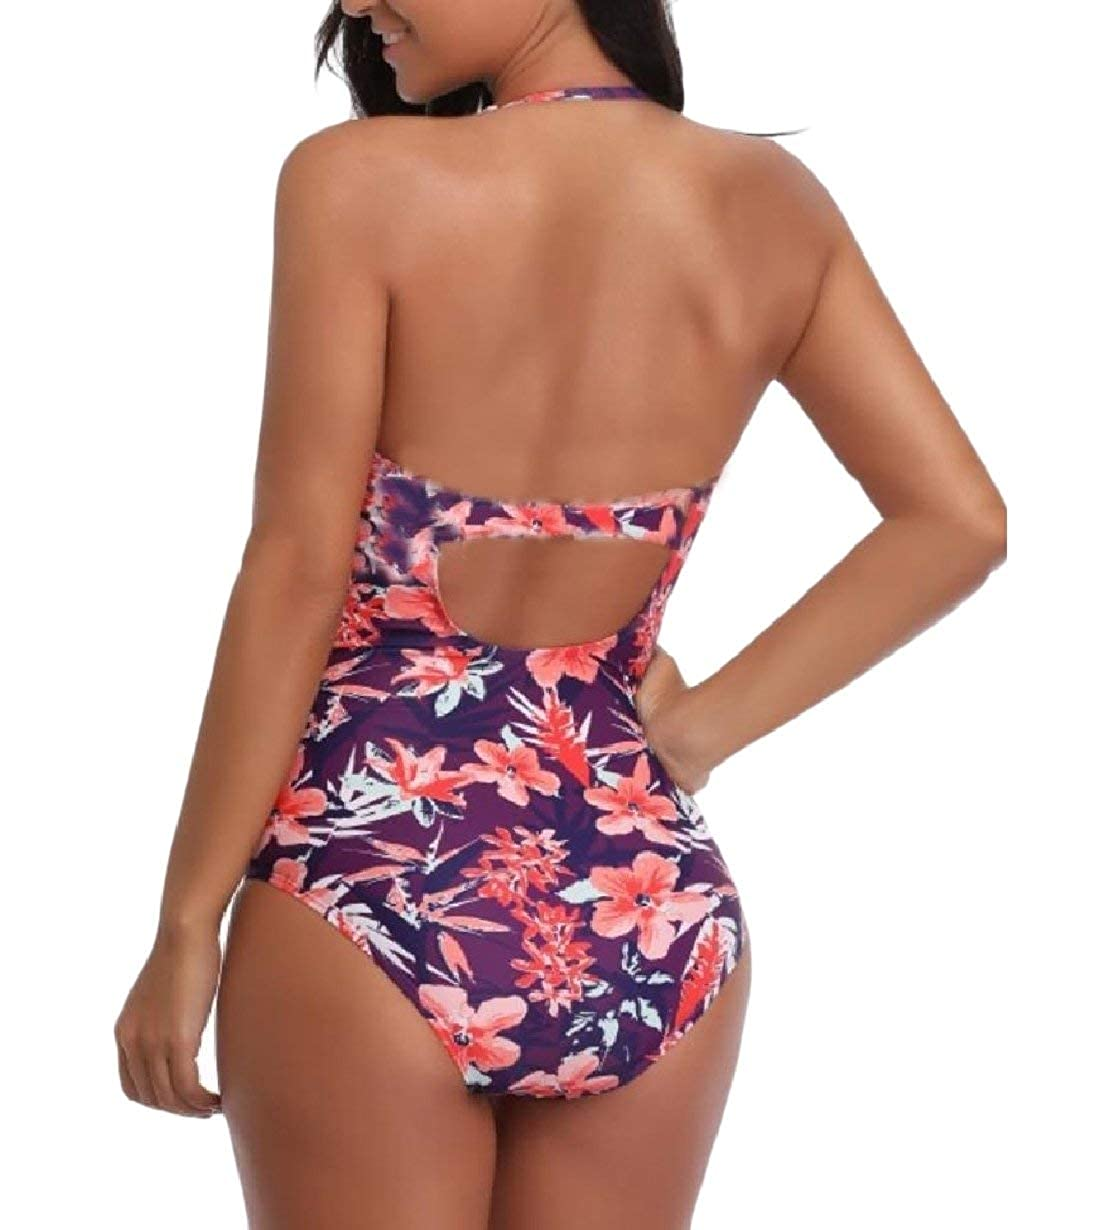 b12b7a442fe Amazon.com  Zimaes-Women Painting Quick Dry Plus Size High Neck Monokini  Swimwear  Clothing